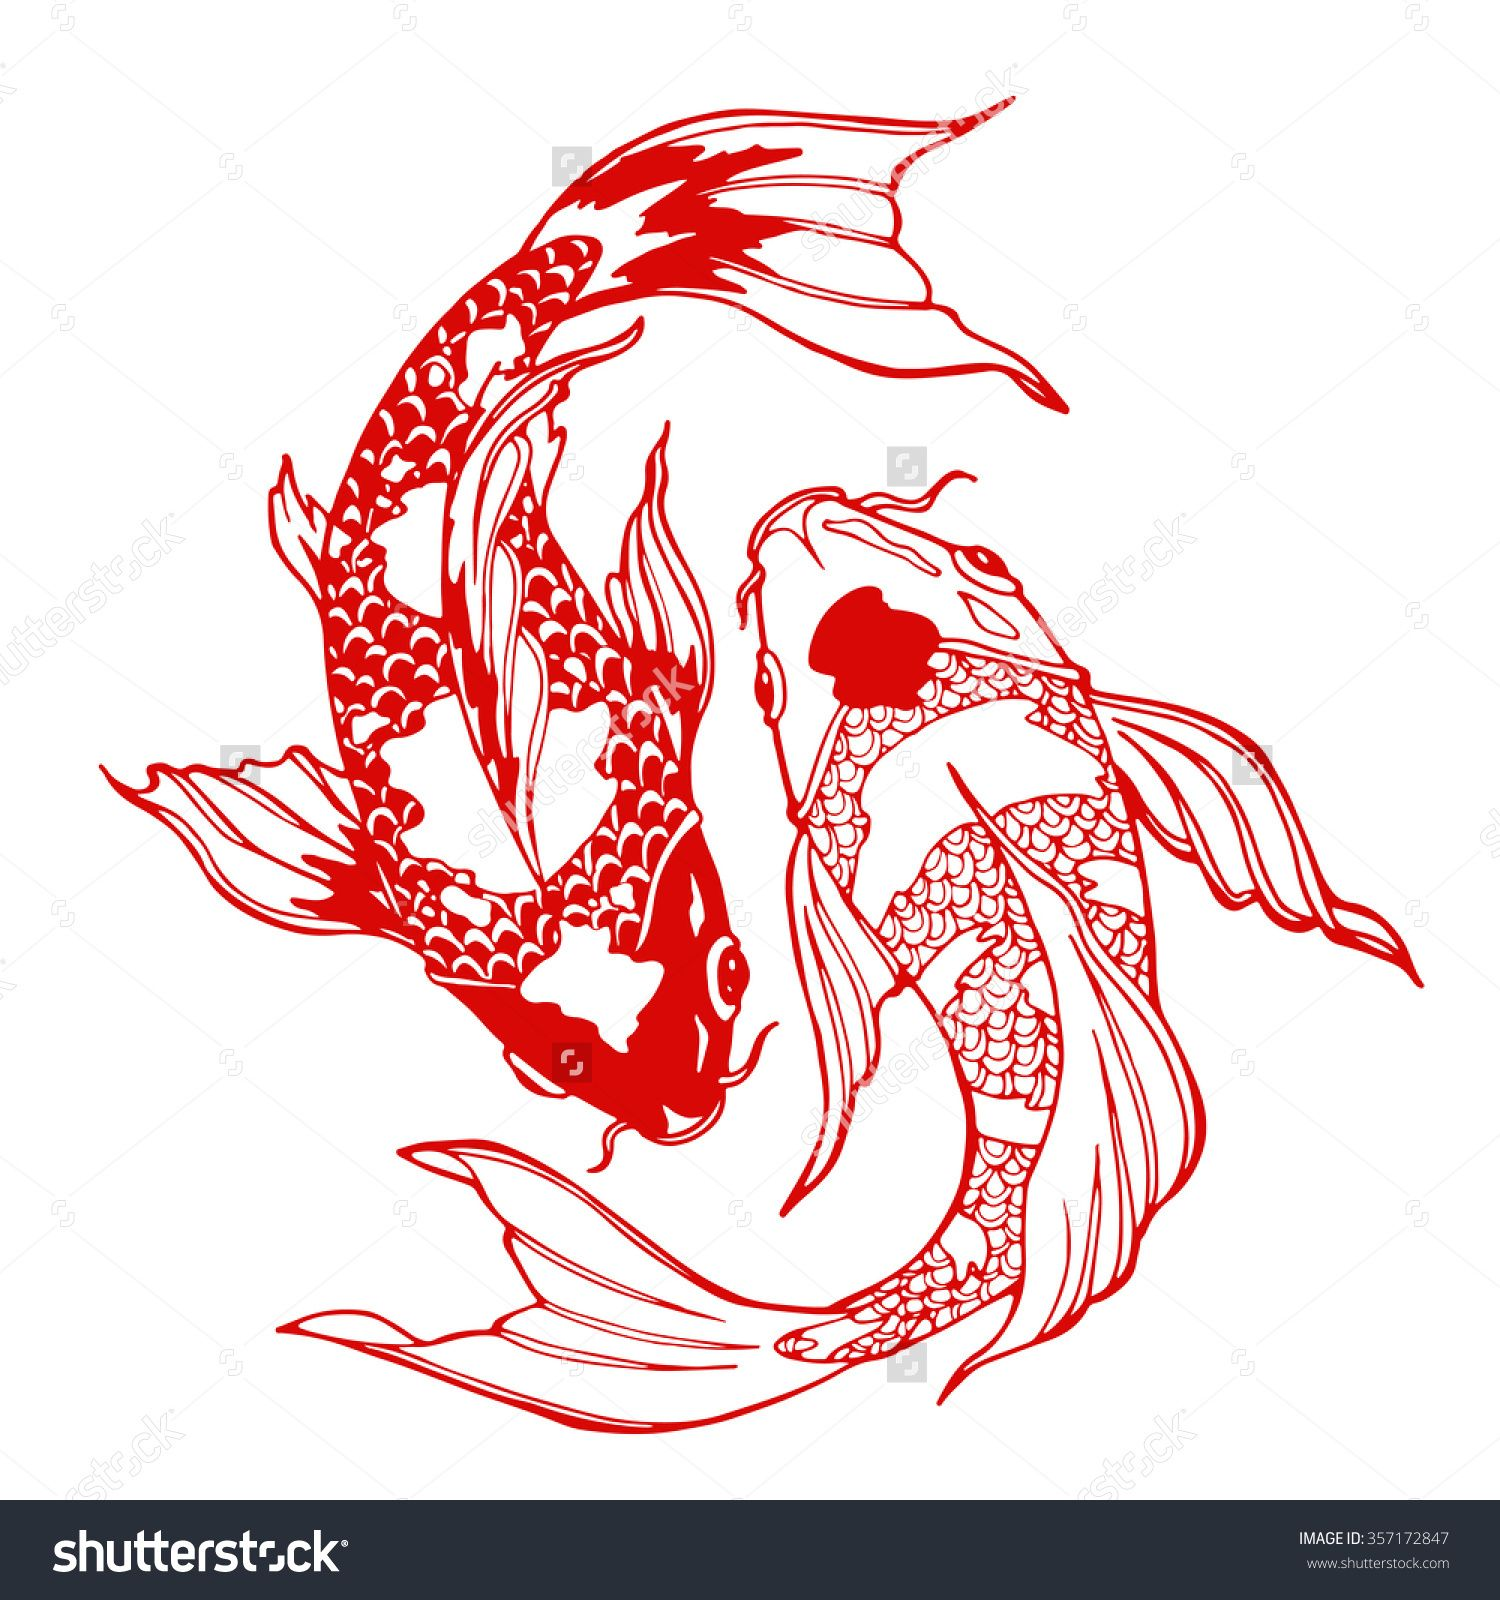 Illustration Koi Carp Coloring Page Yin Stock Vector (Royalty Free) 357172847